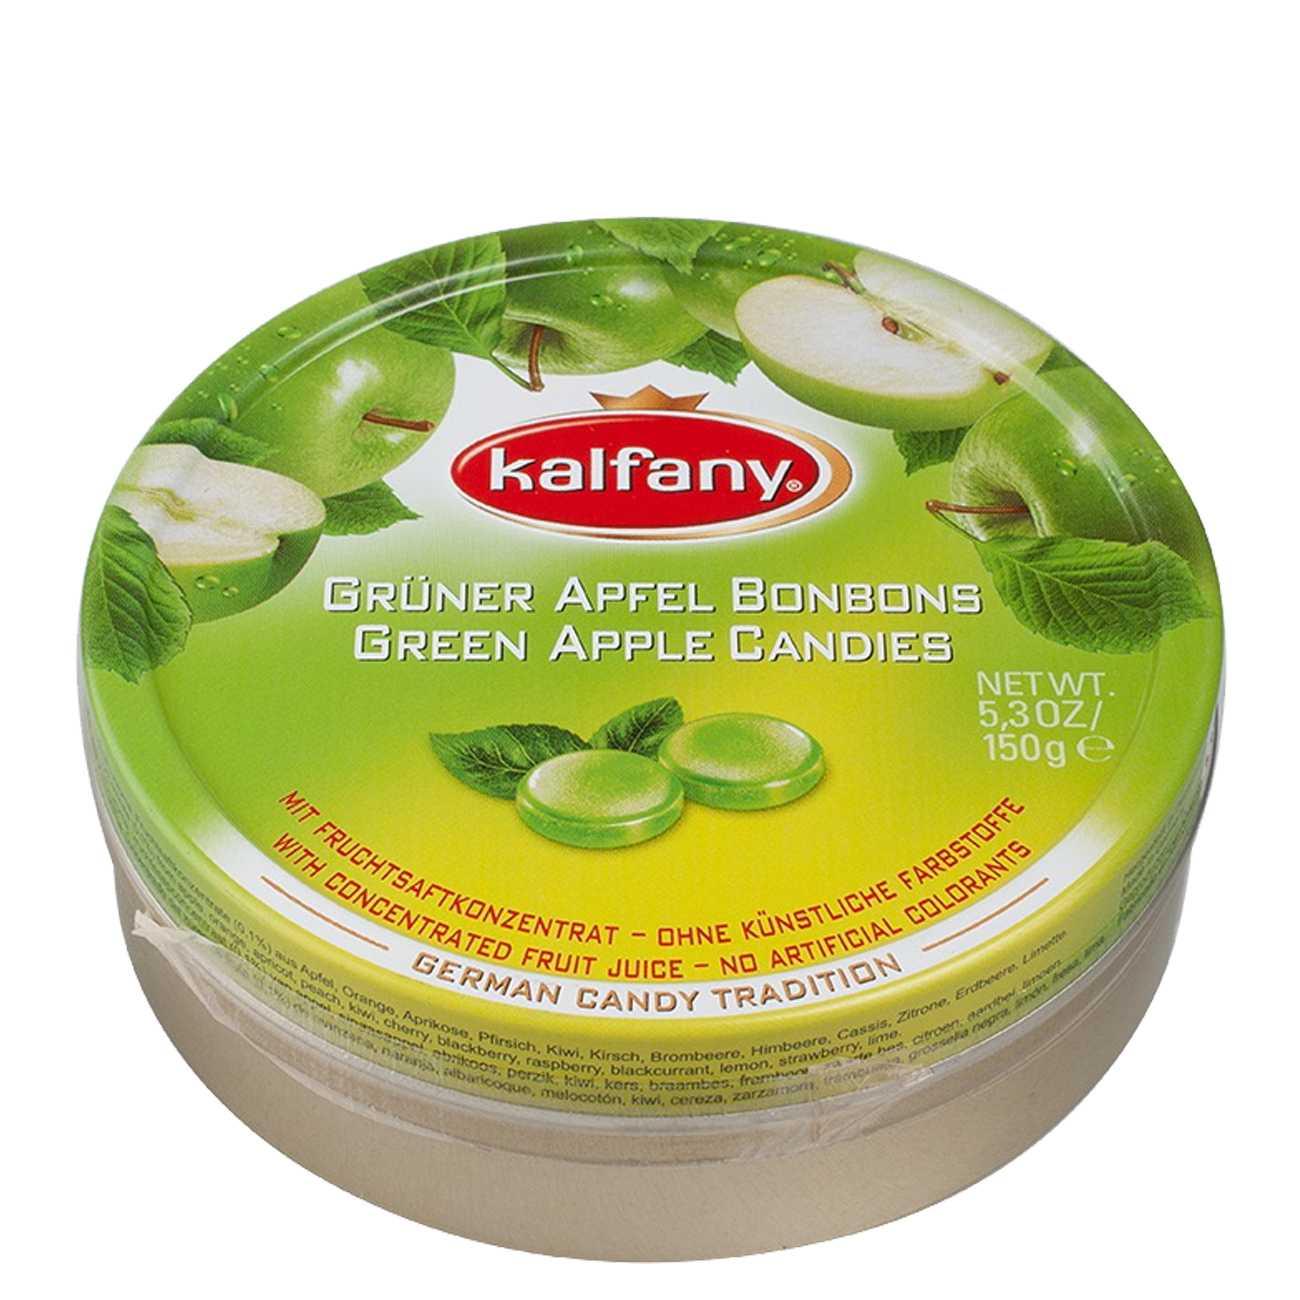 GREEN APPLE CANDIES 150 G